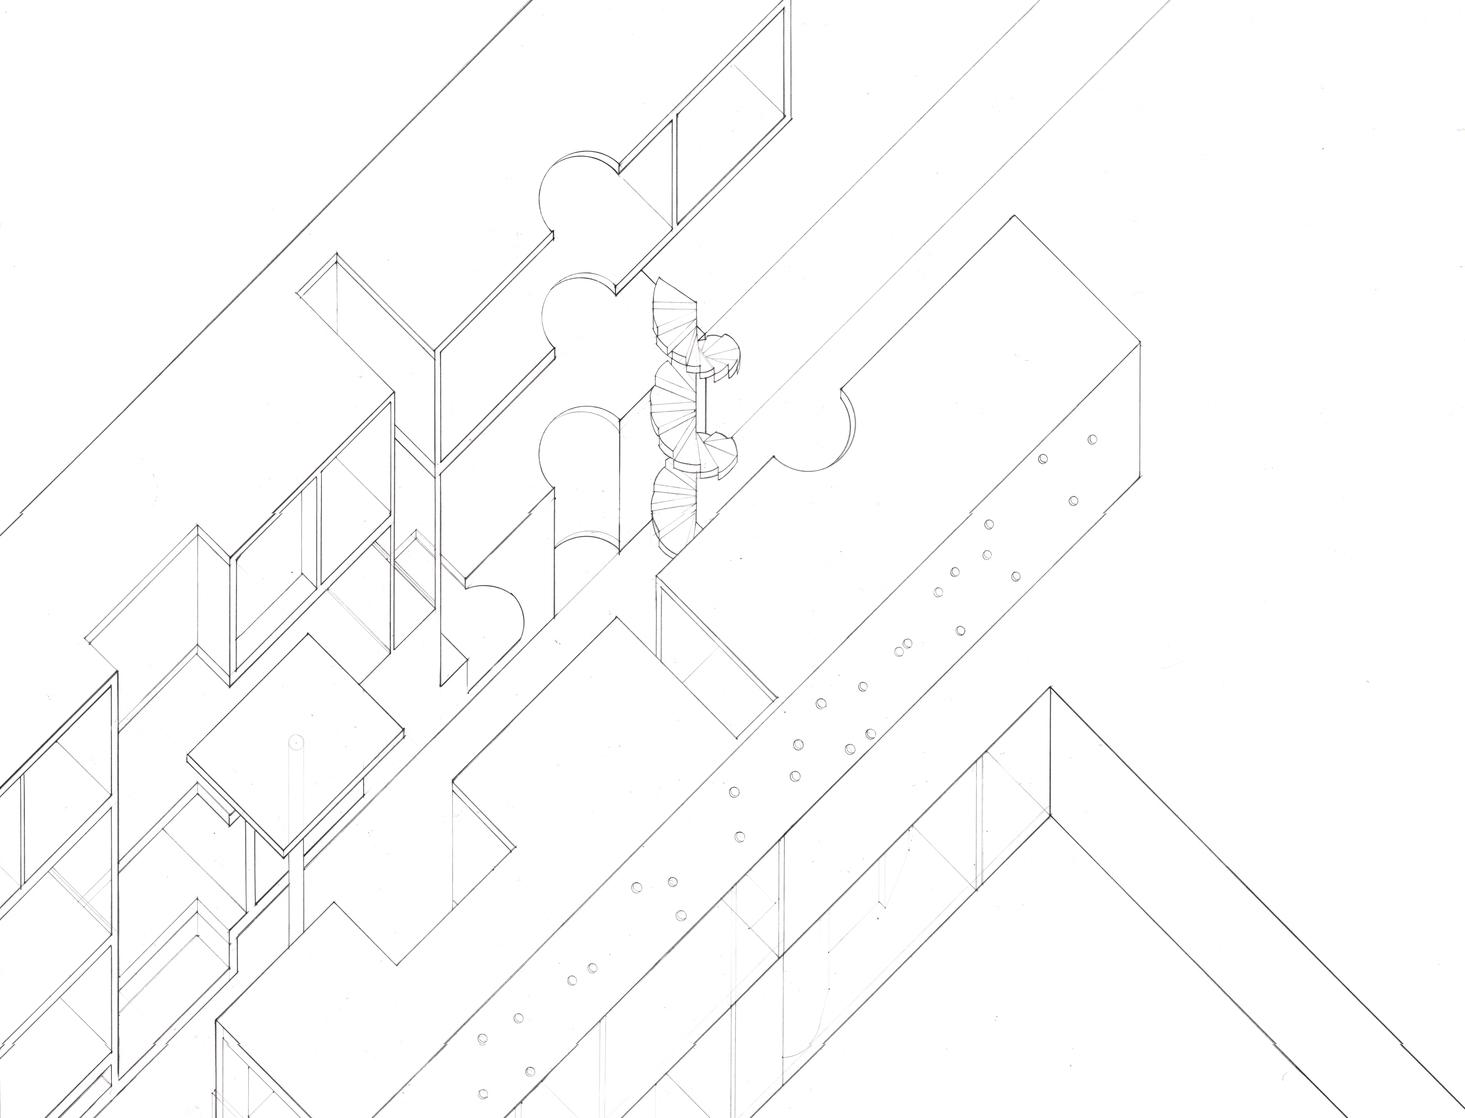 sectionaxon.jpg